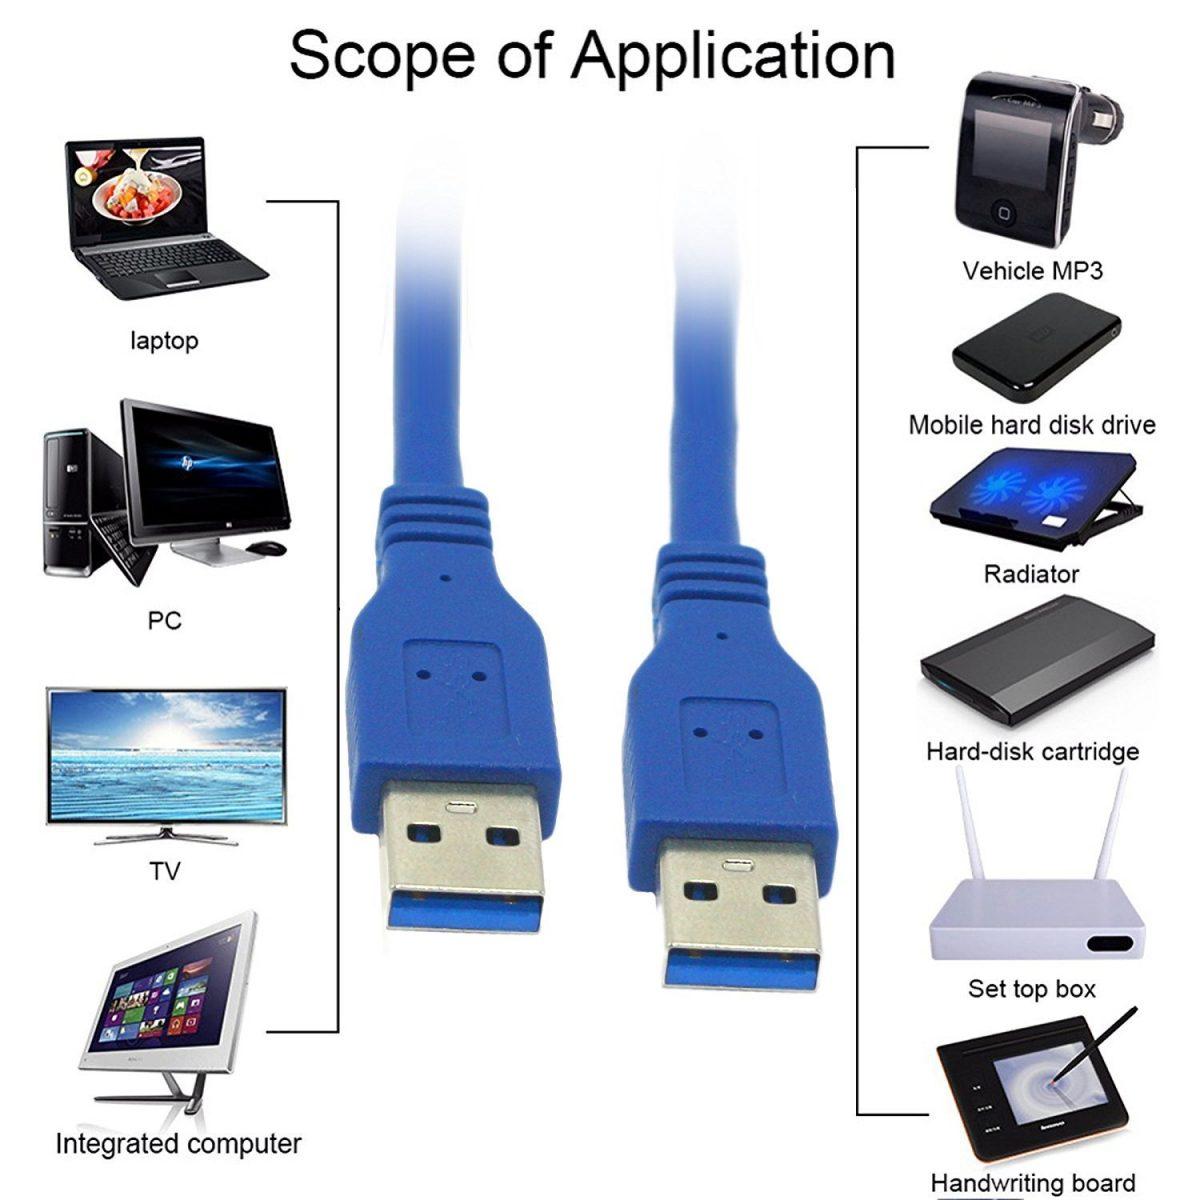 کاربرد کابل usb 3.0